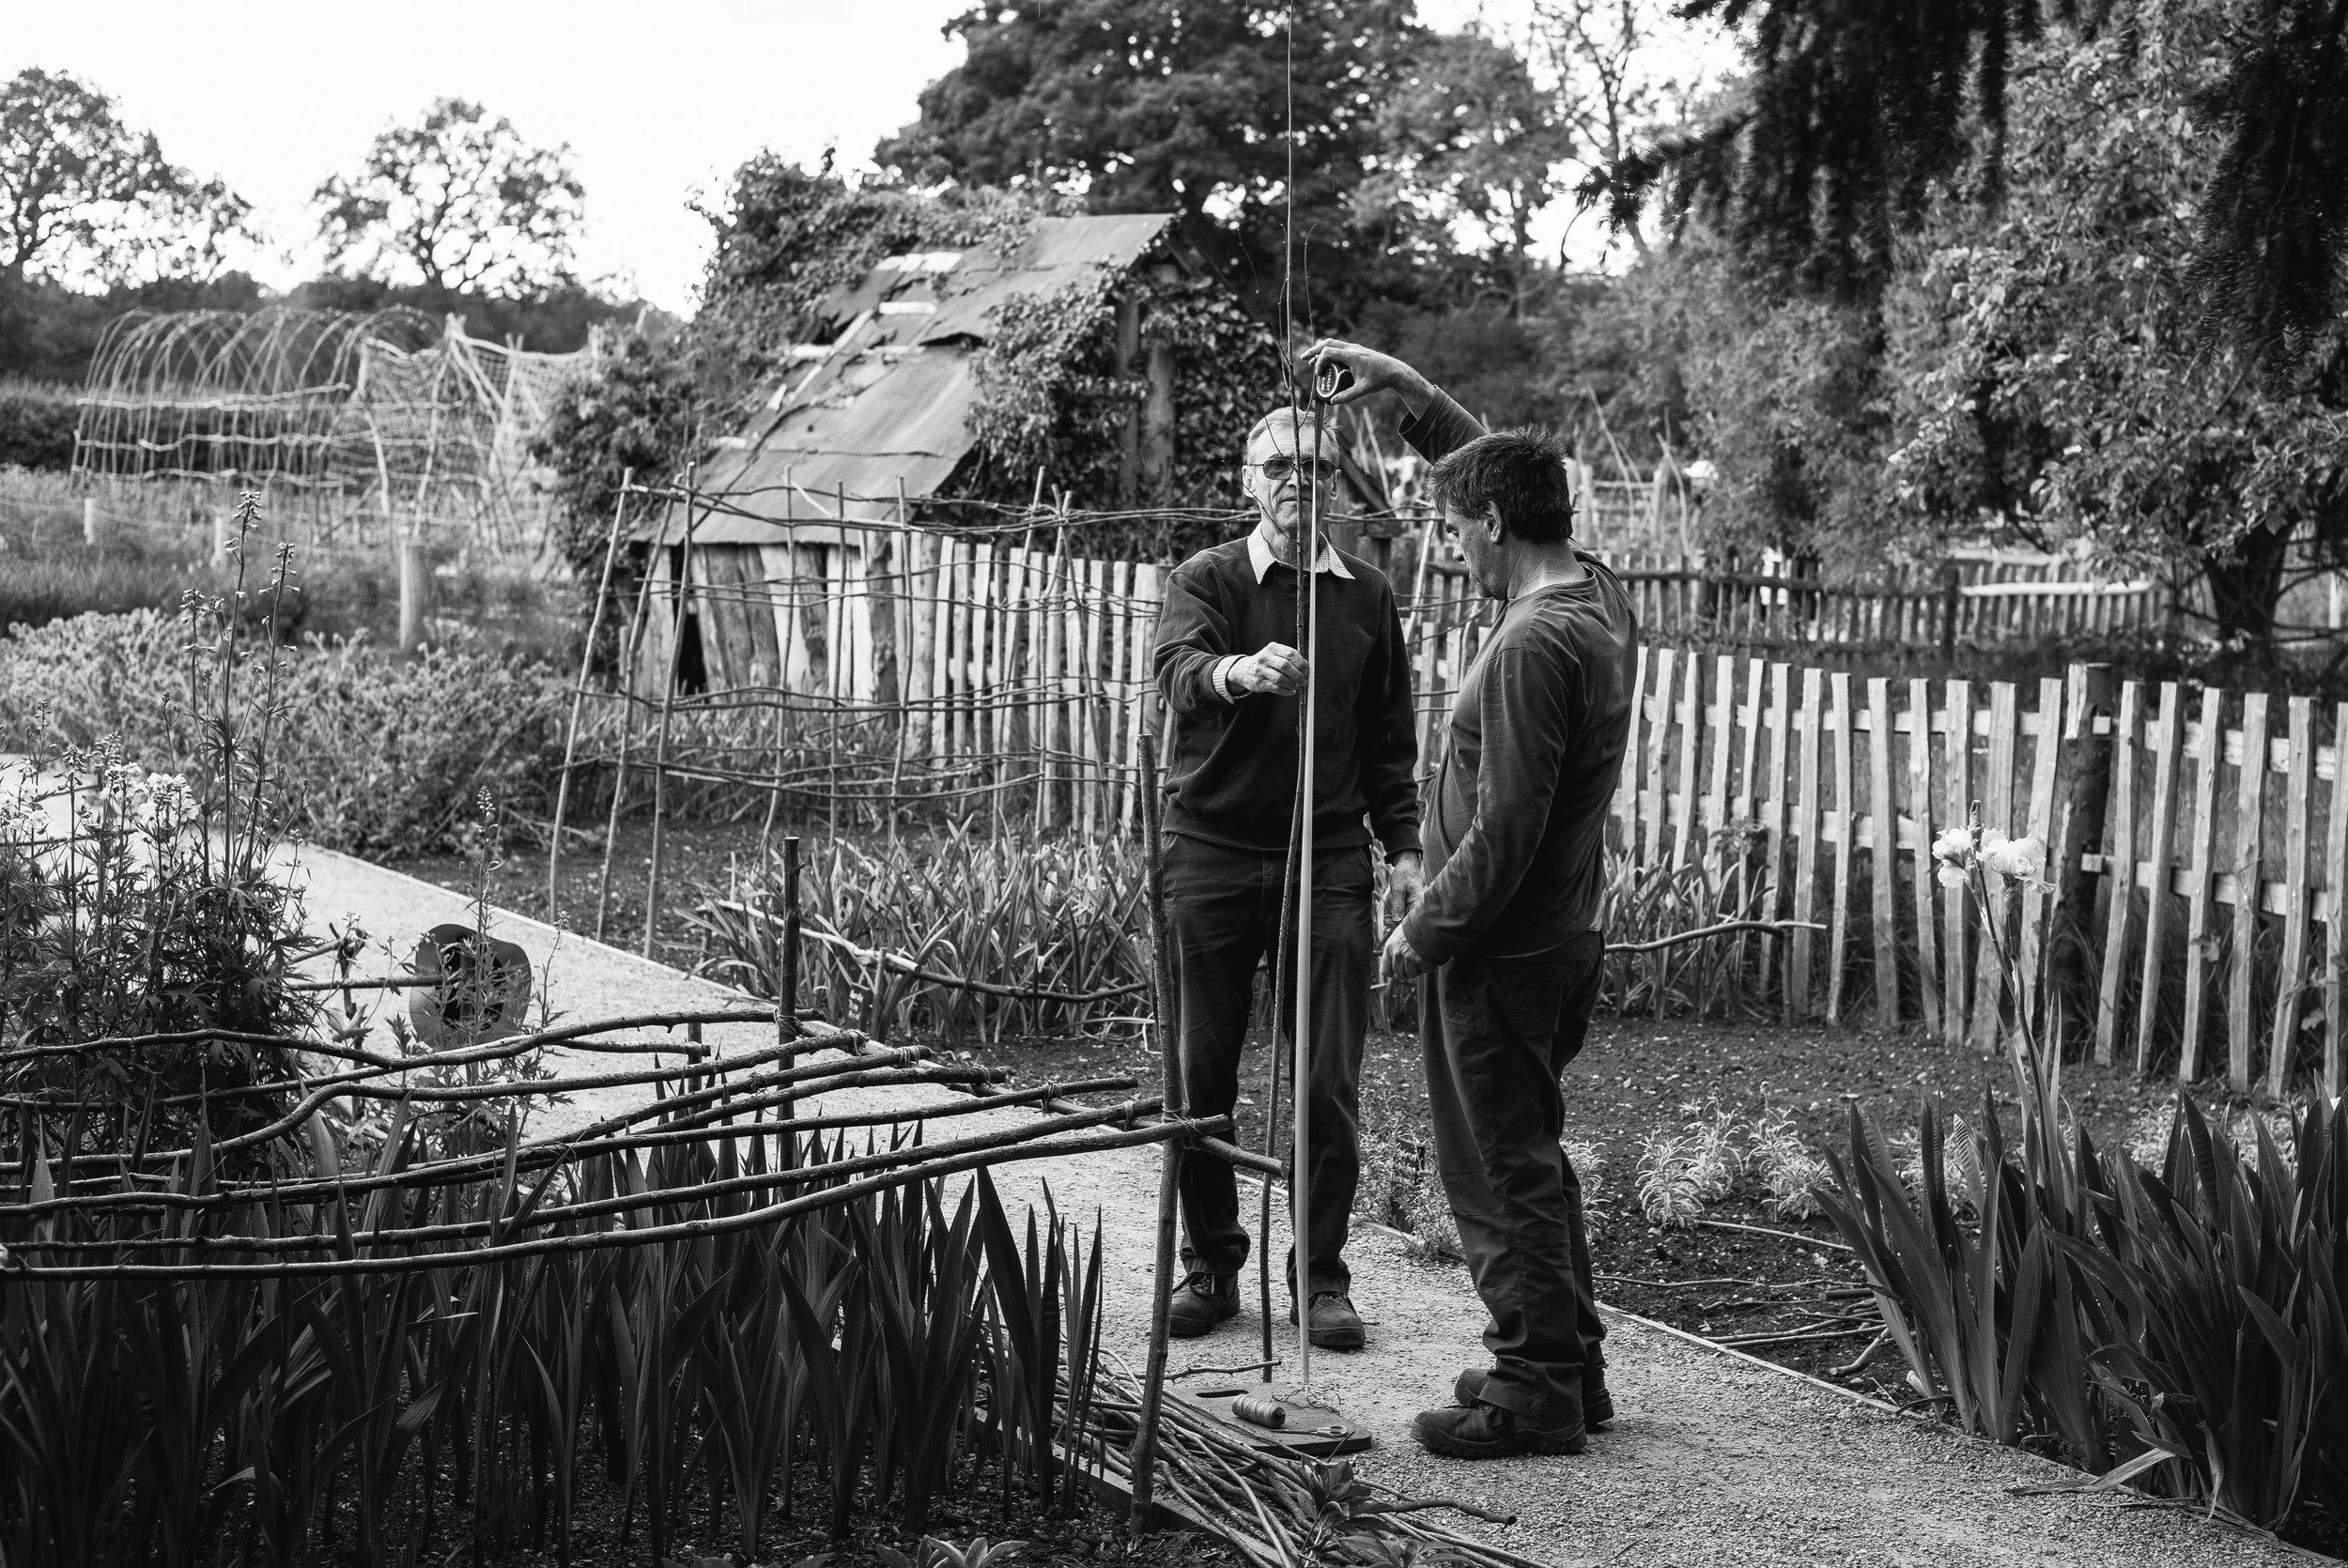 Gardening - Clifford Darby 2019